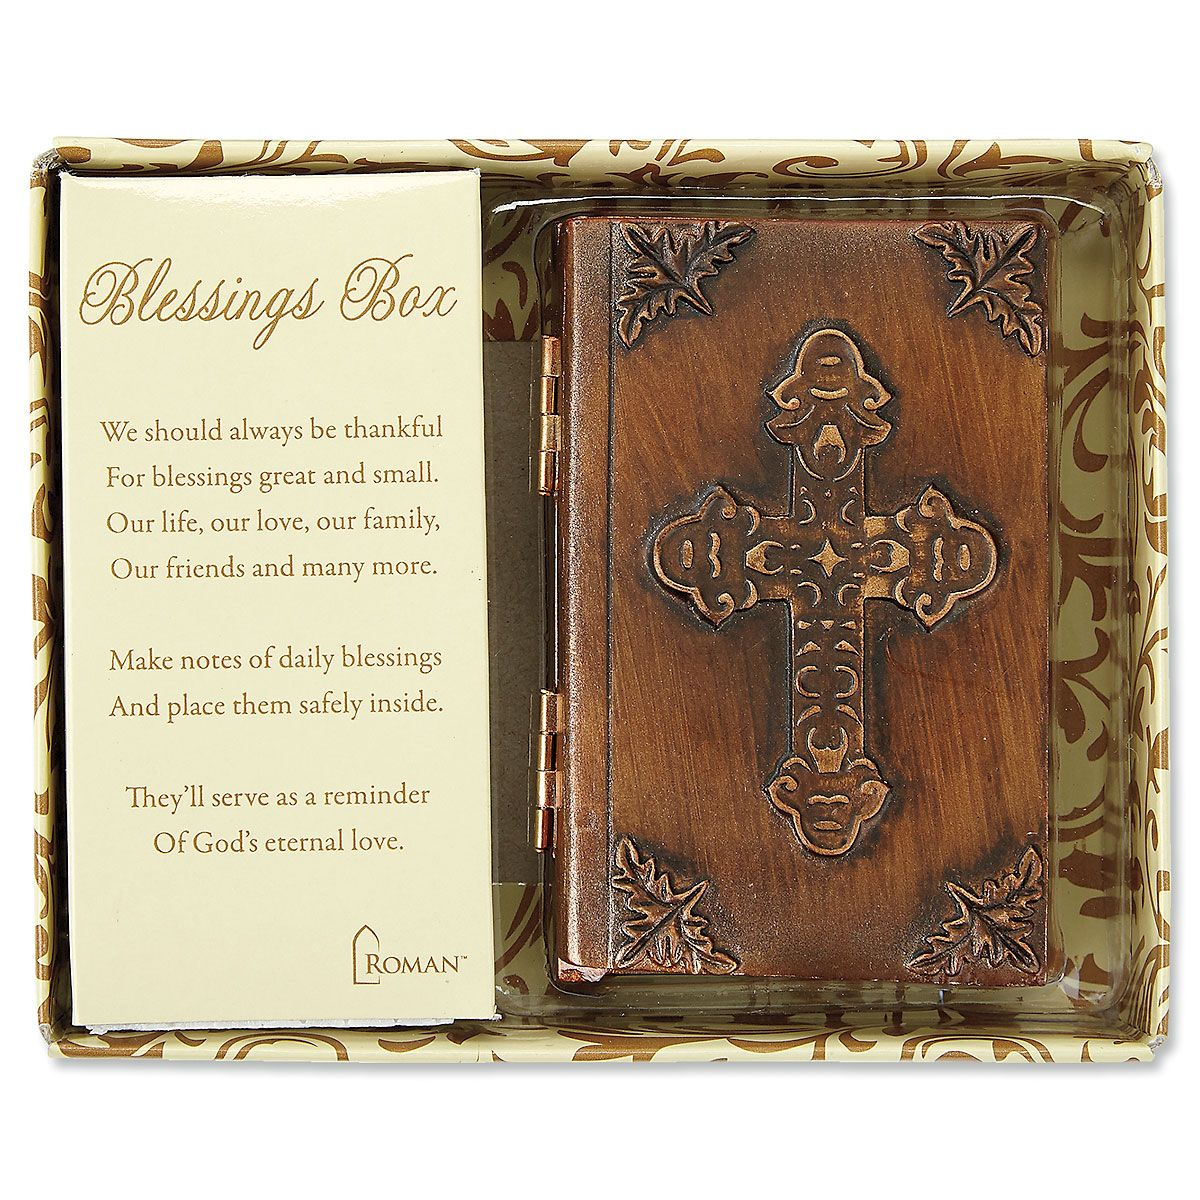 Blessings Box